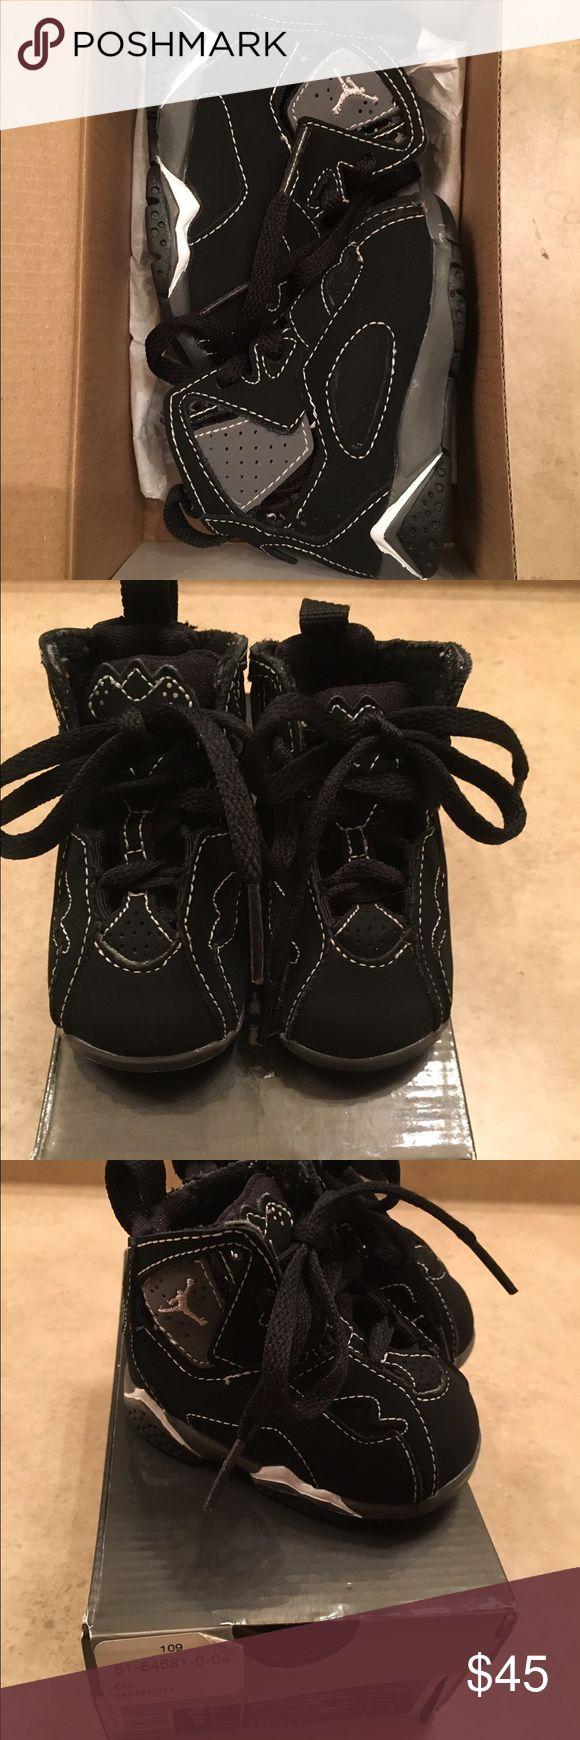 Jordan True Flight infant size 2 Like new Jordan True Flight. Jordan Shoes Sneakers